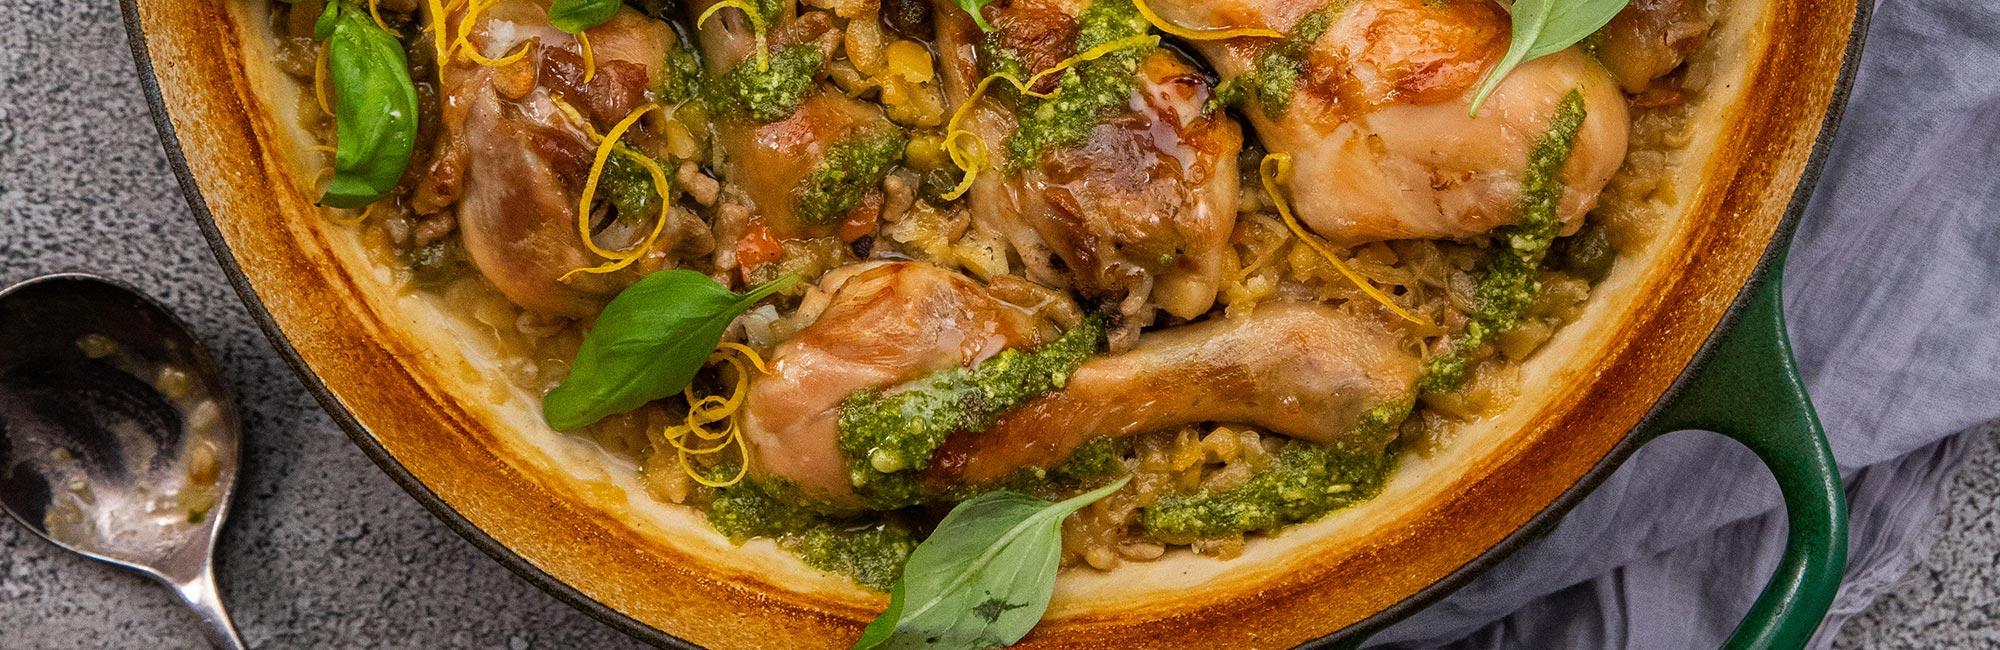 Lemon Chicken Drumsticks and Vegetable Casserole Recipe